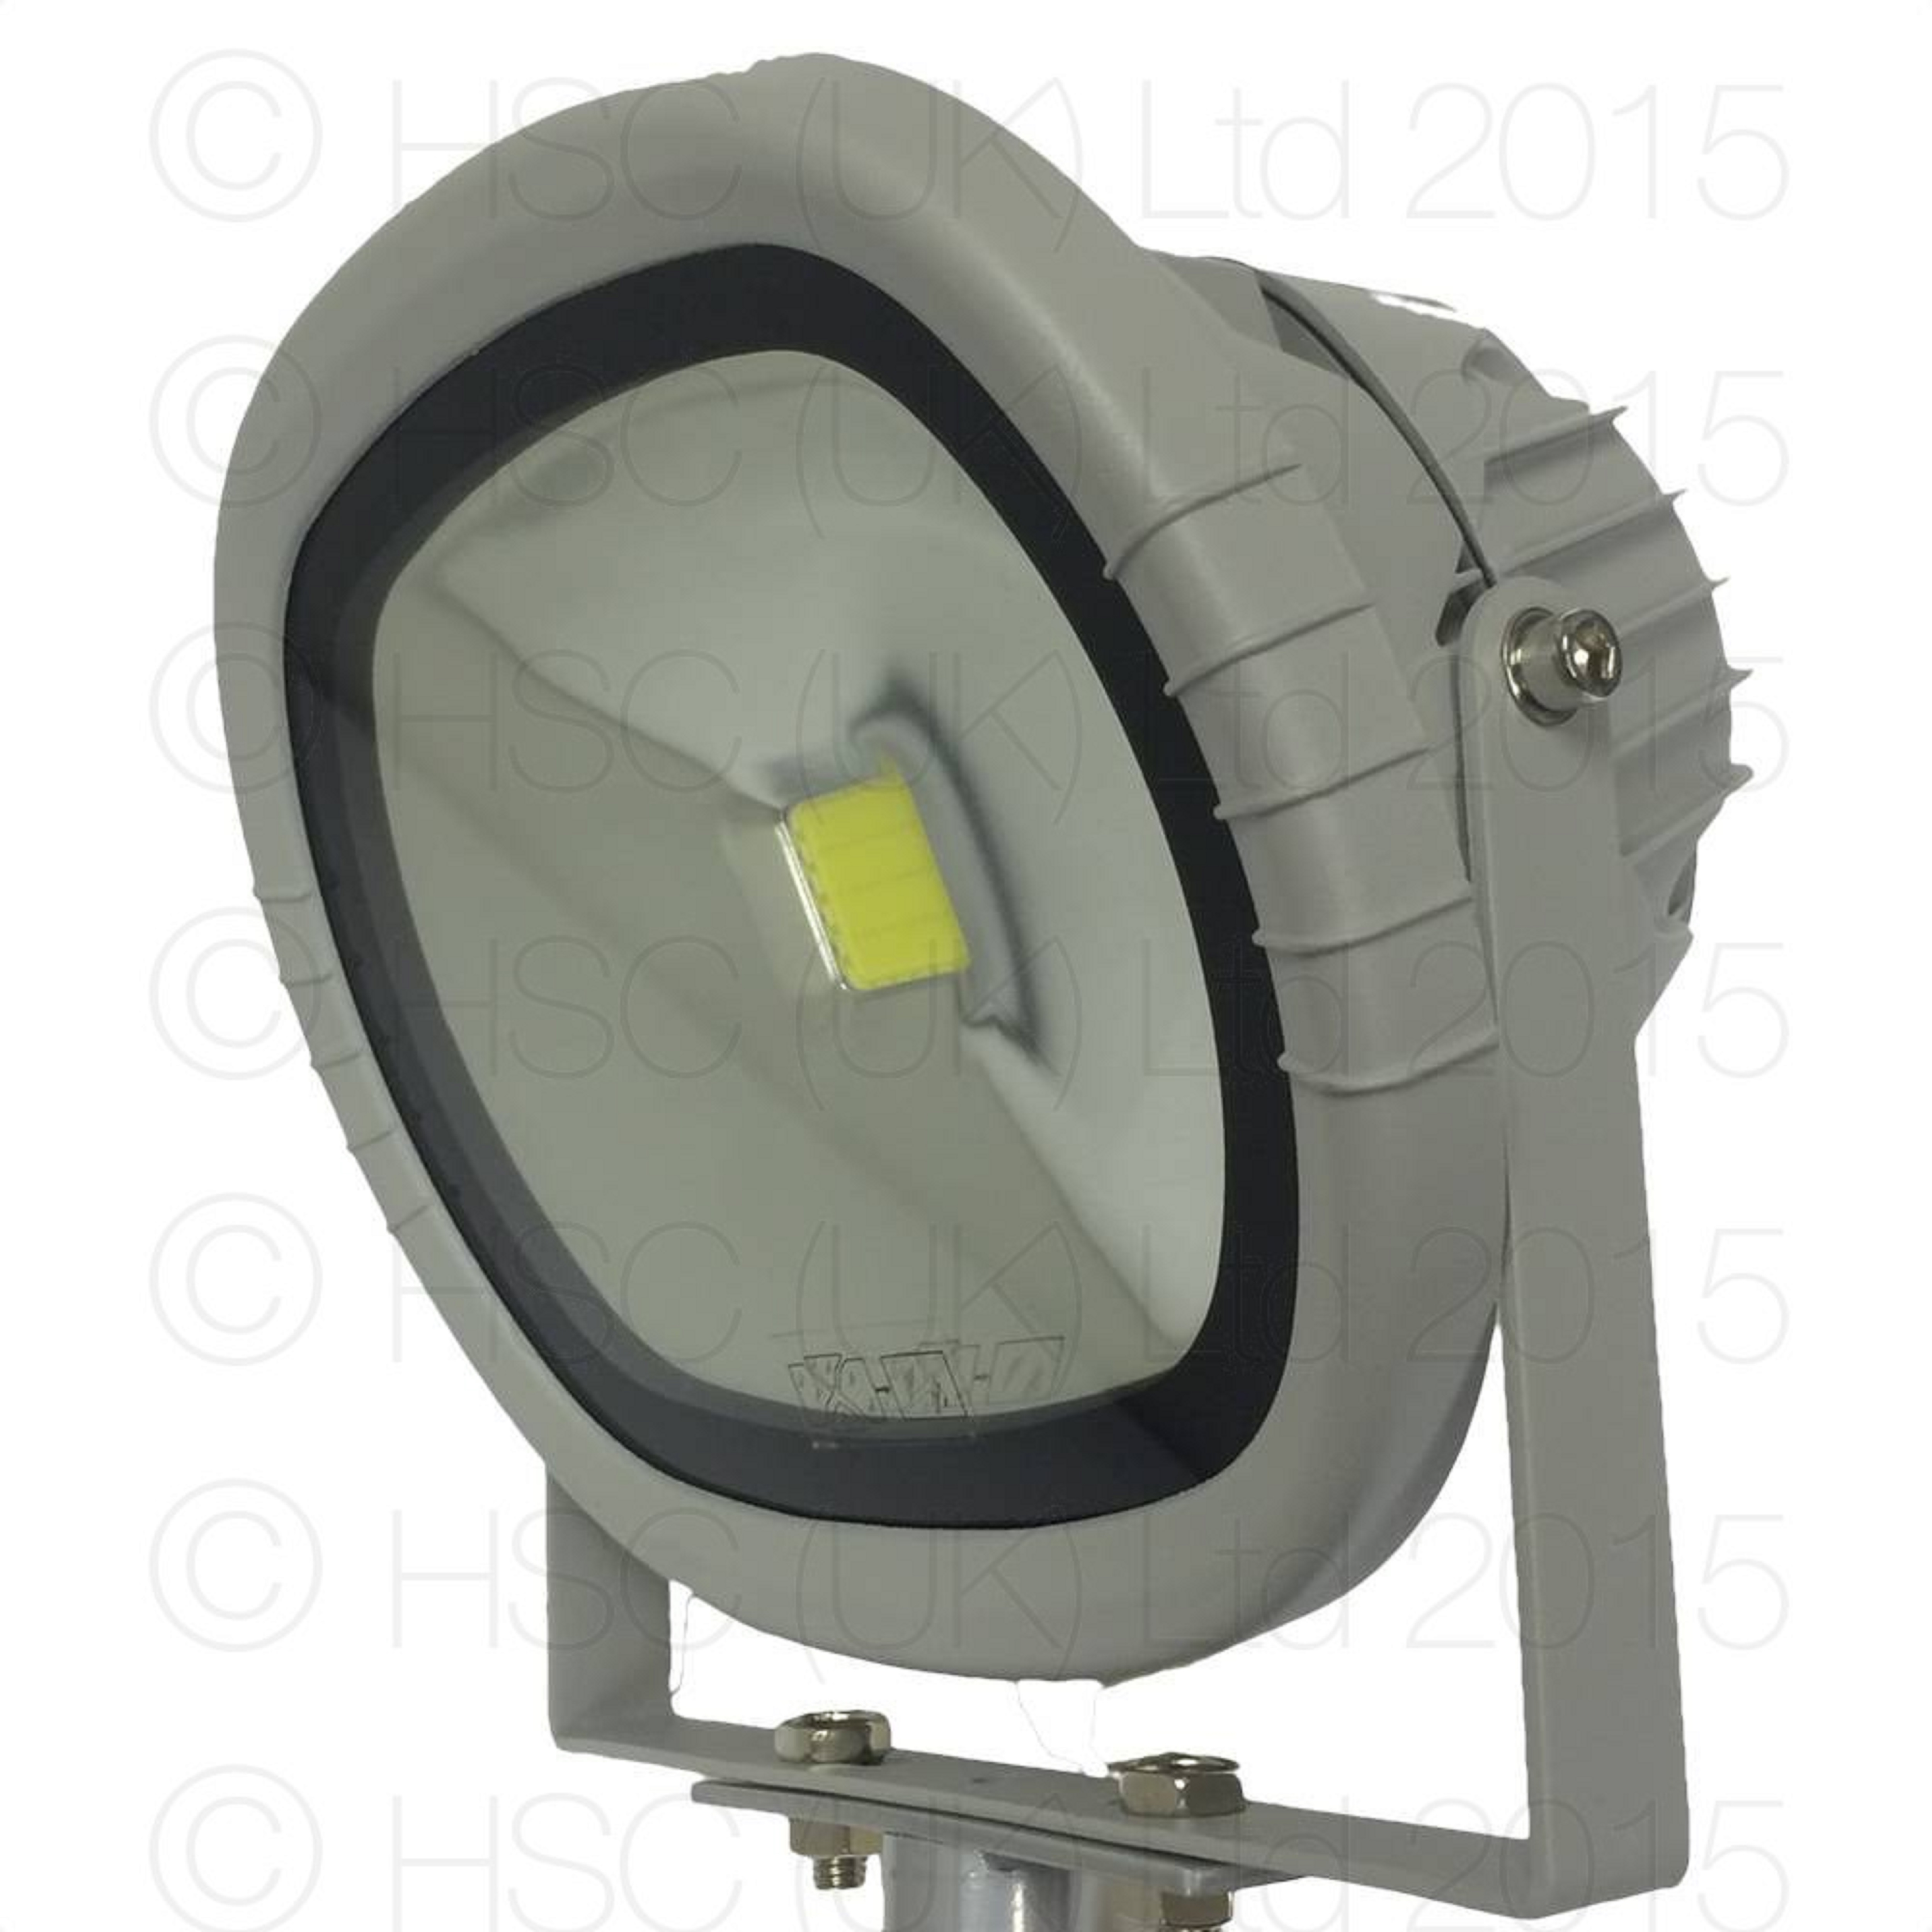 ELITE 30WATT LED HEAD ONLY (2700lm)